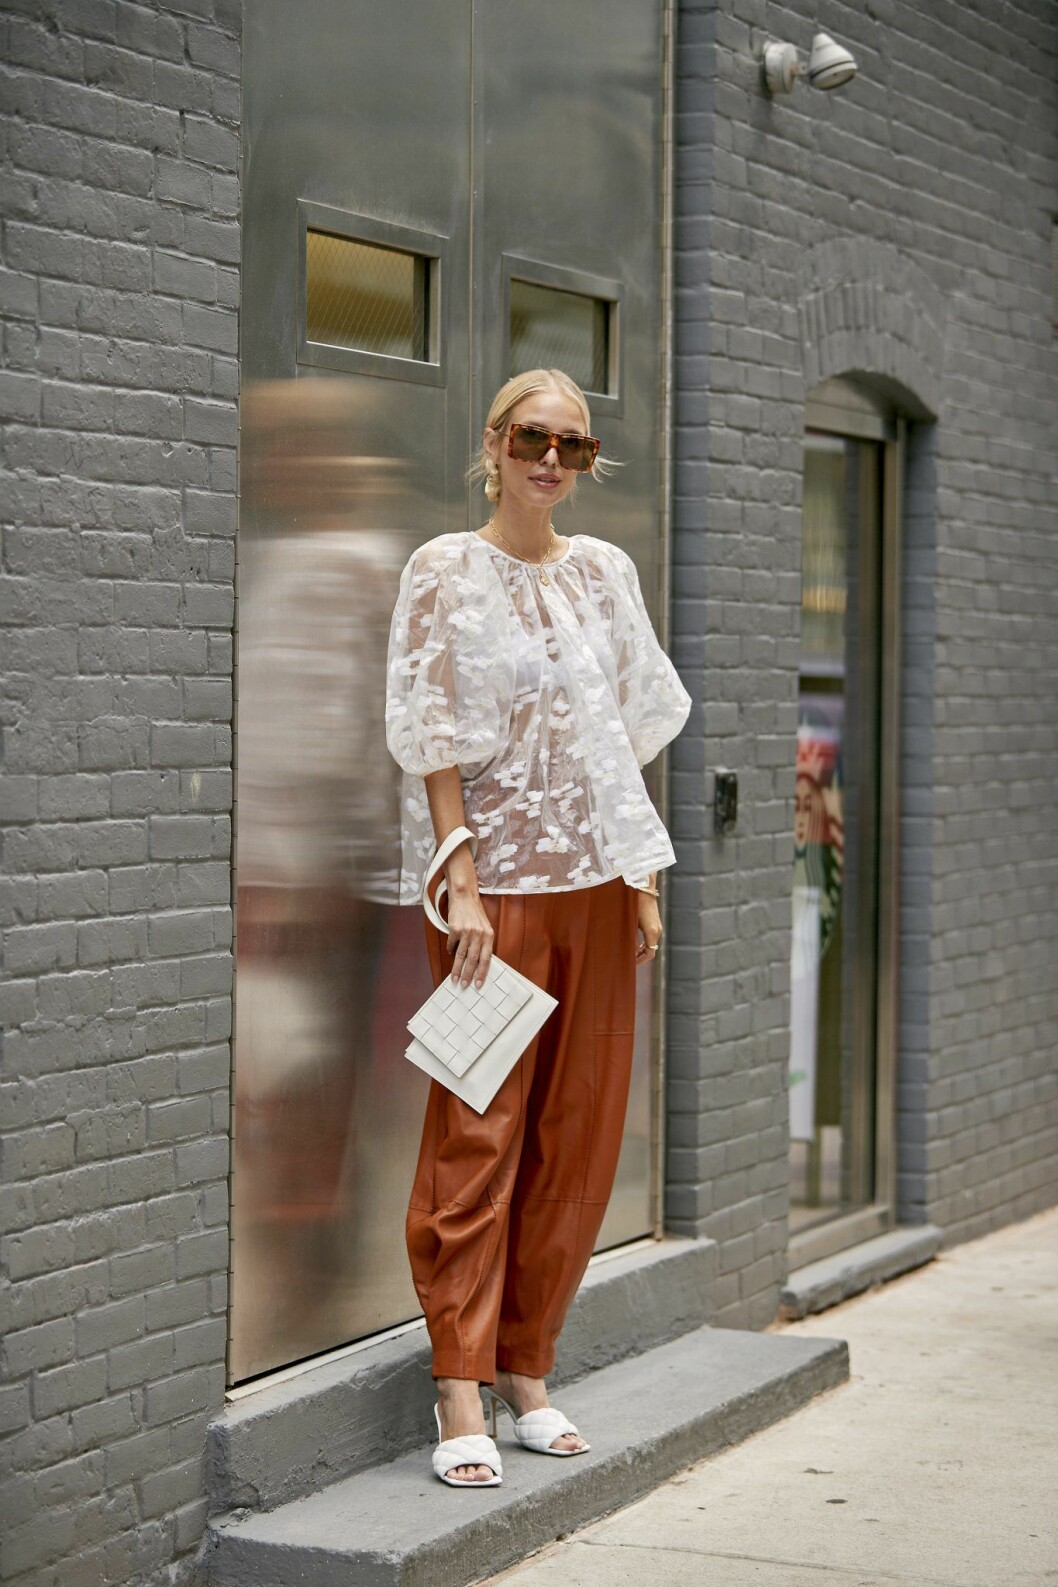 streetstyle från New York fashion week.